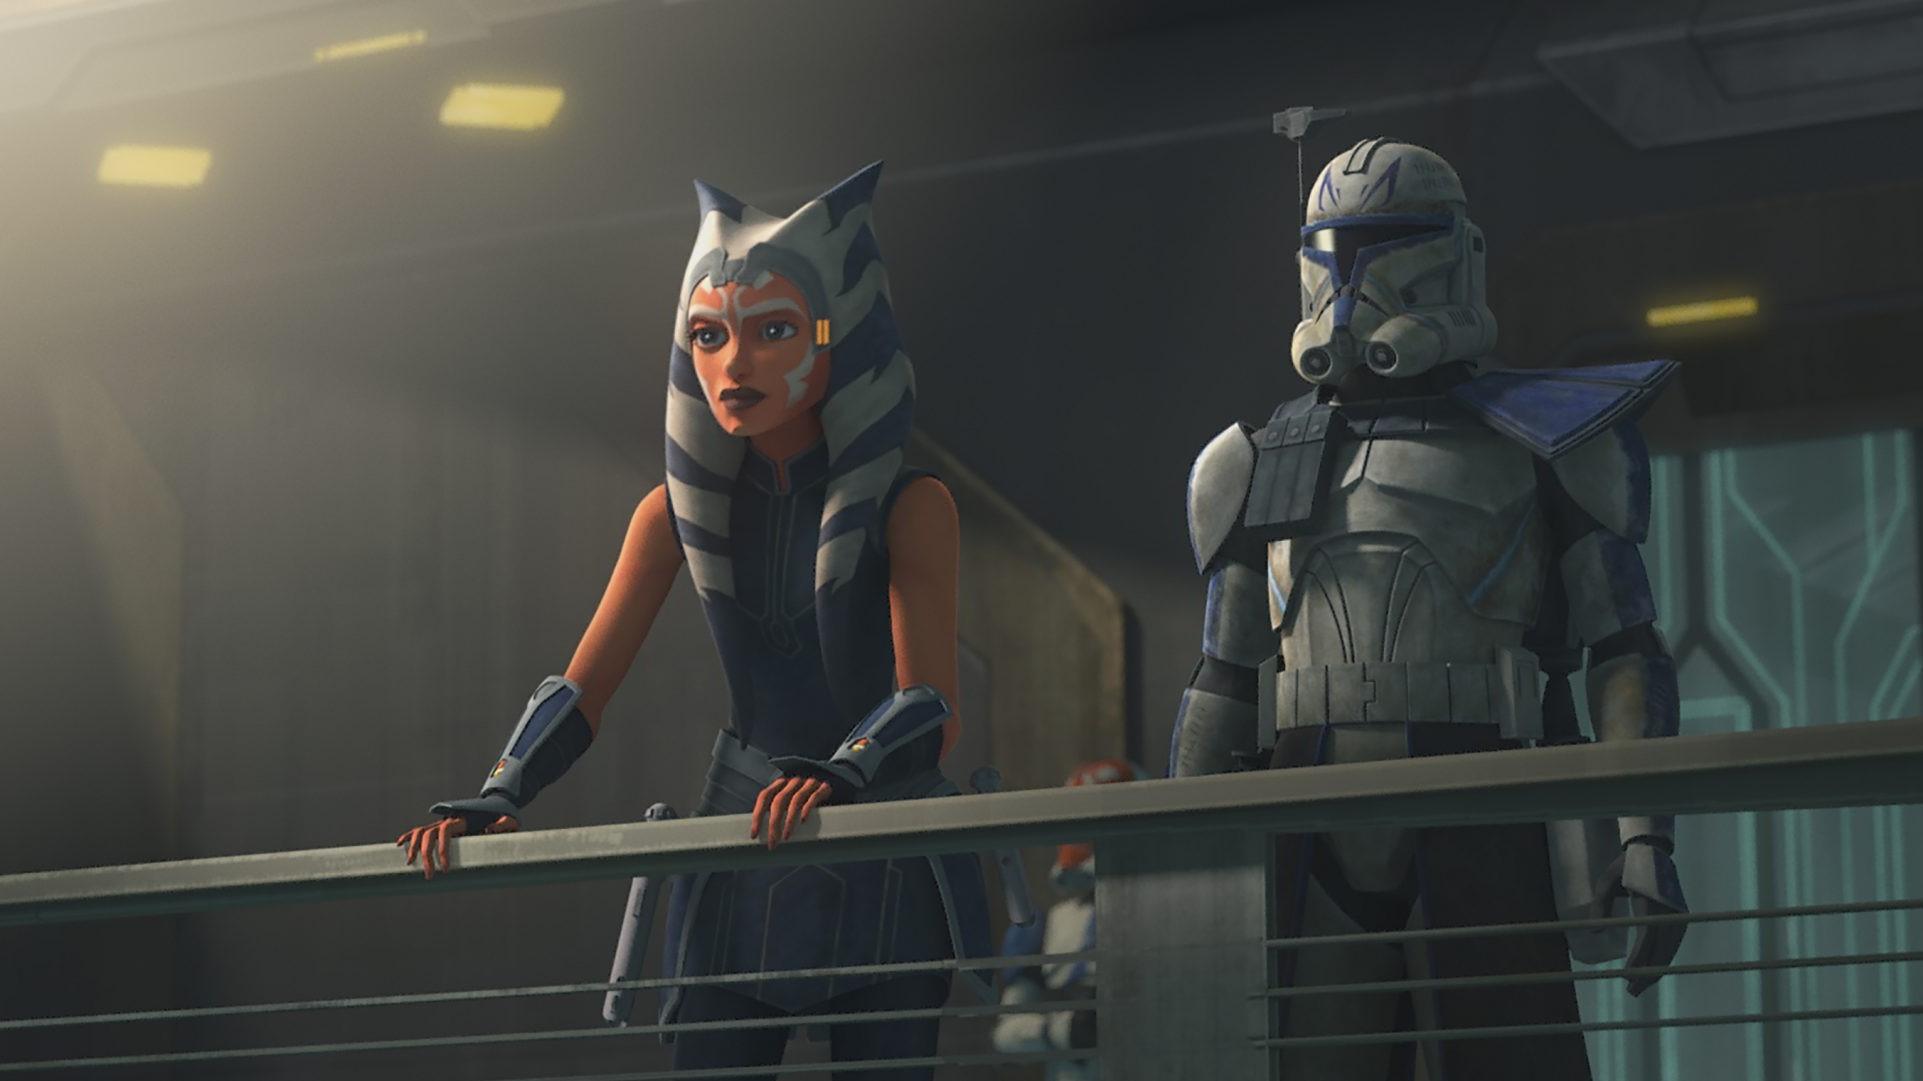 Ahsoka Tano and Rex in The Clone Wars.